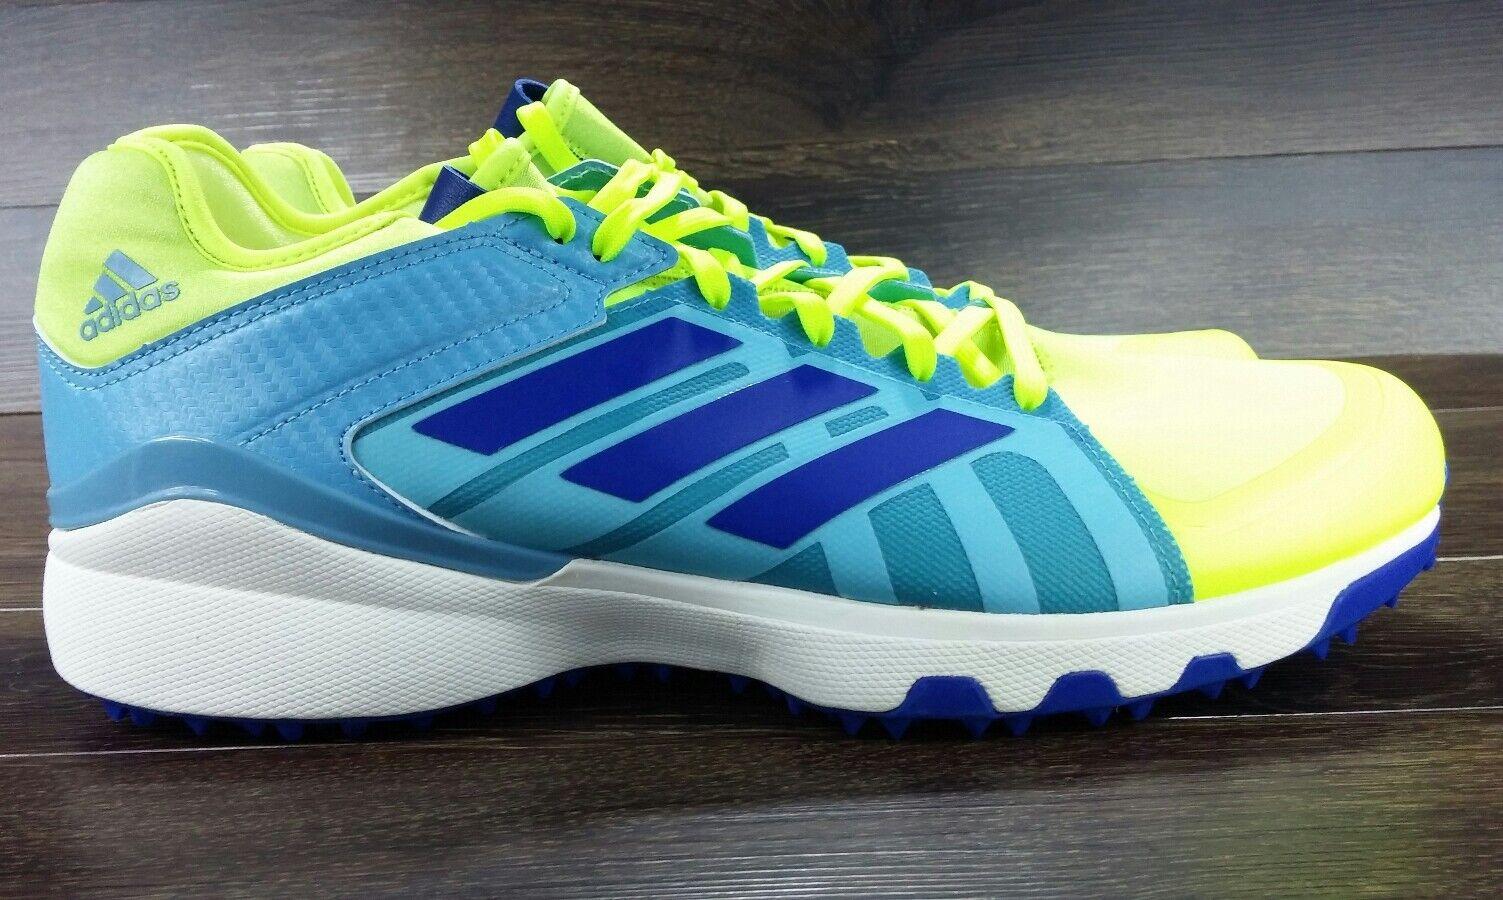 Adidas LUX Field Hockey Turf shoes Yellow Royal bluee SZ 10.5 ( AQ6510 )